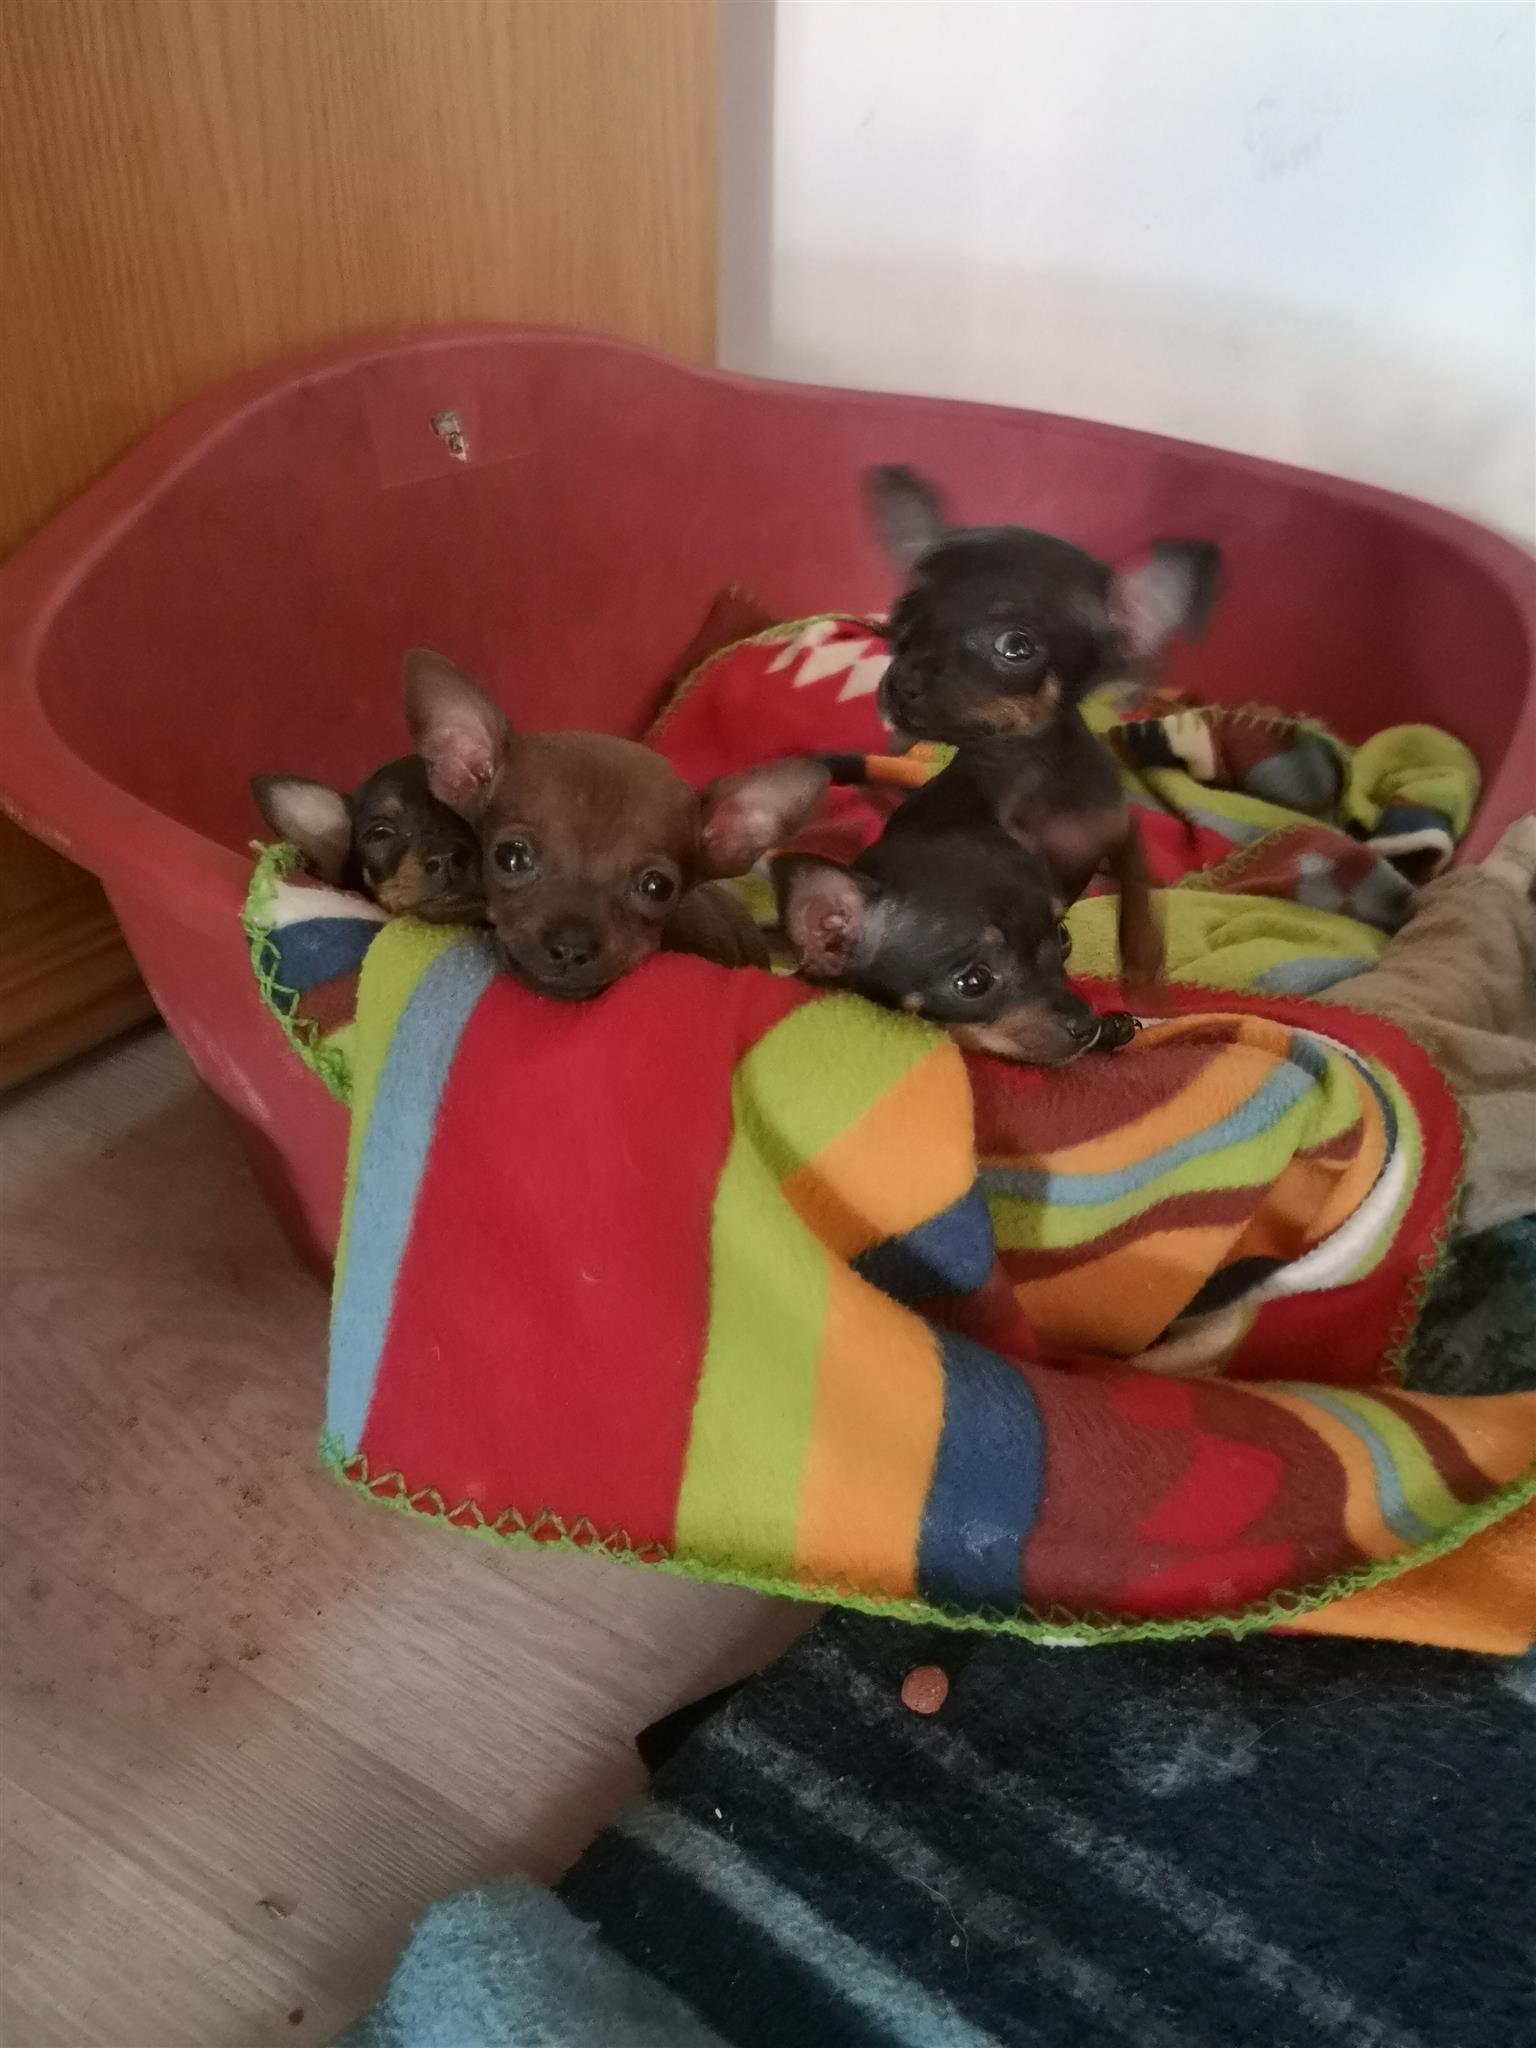 Minature Doberman Puppies (Bokkie Hondjies)